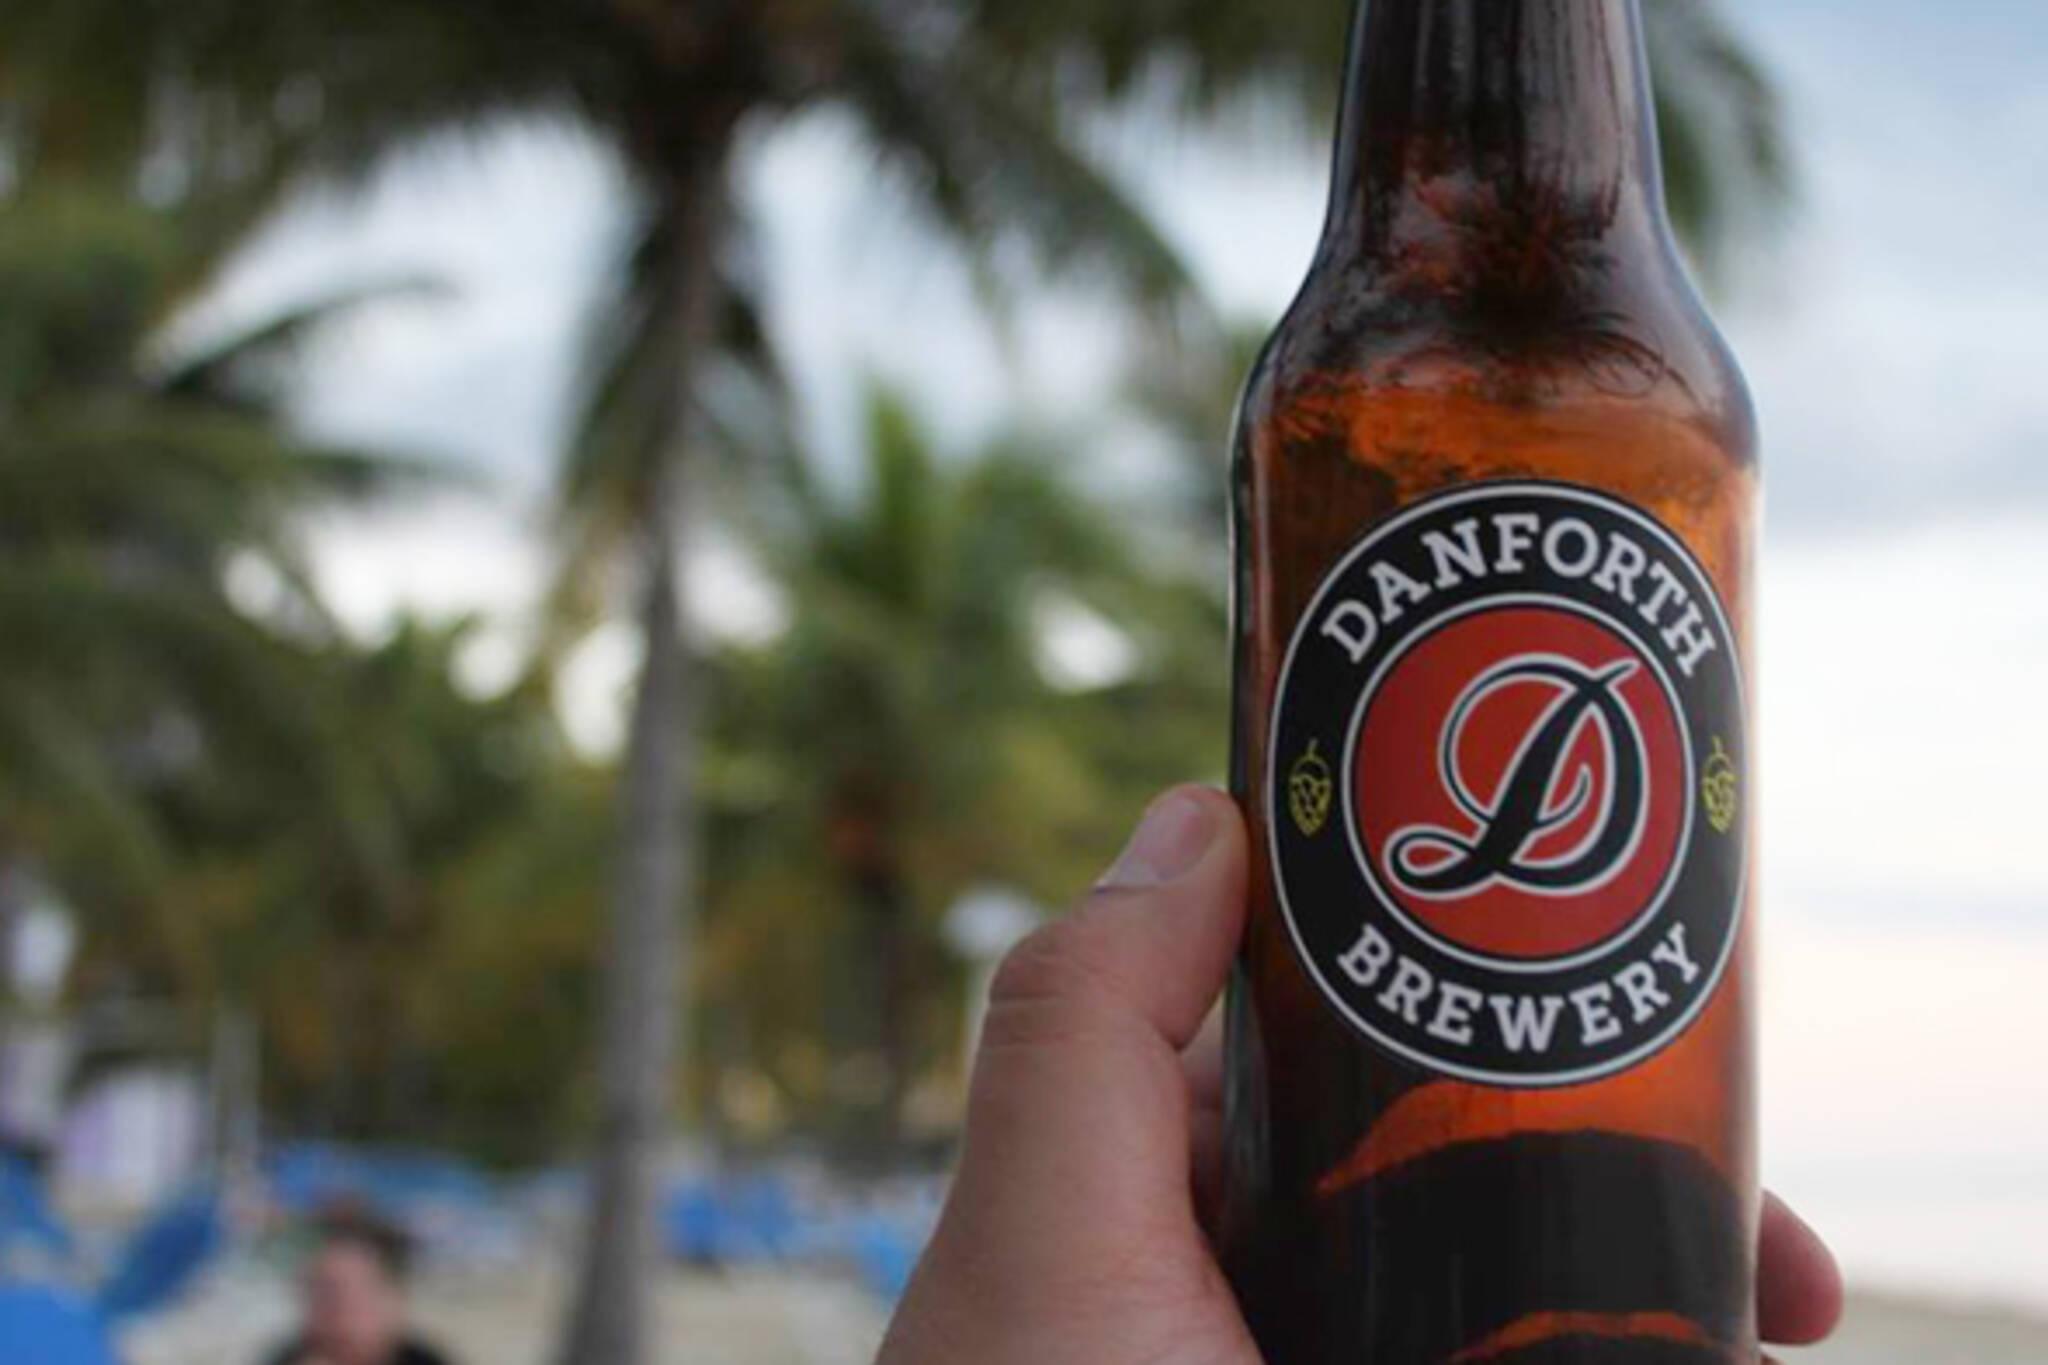 danforth brewery toronto